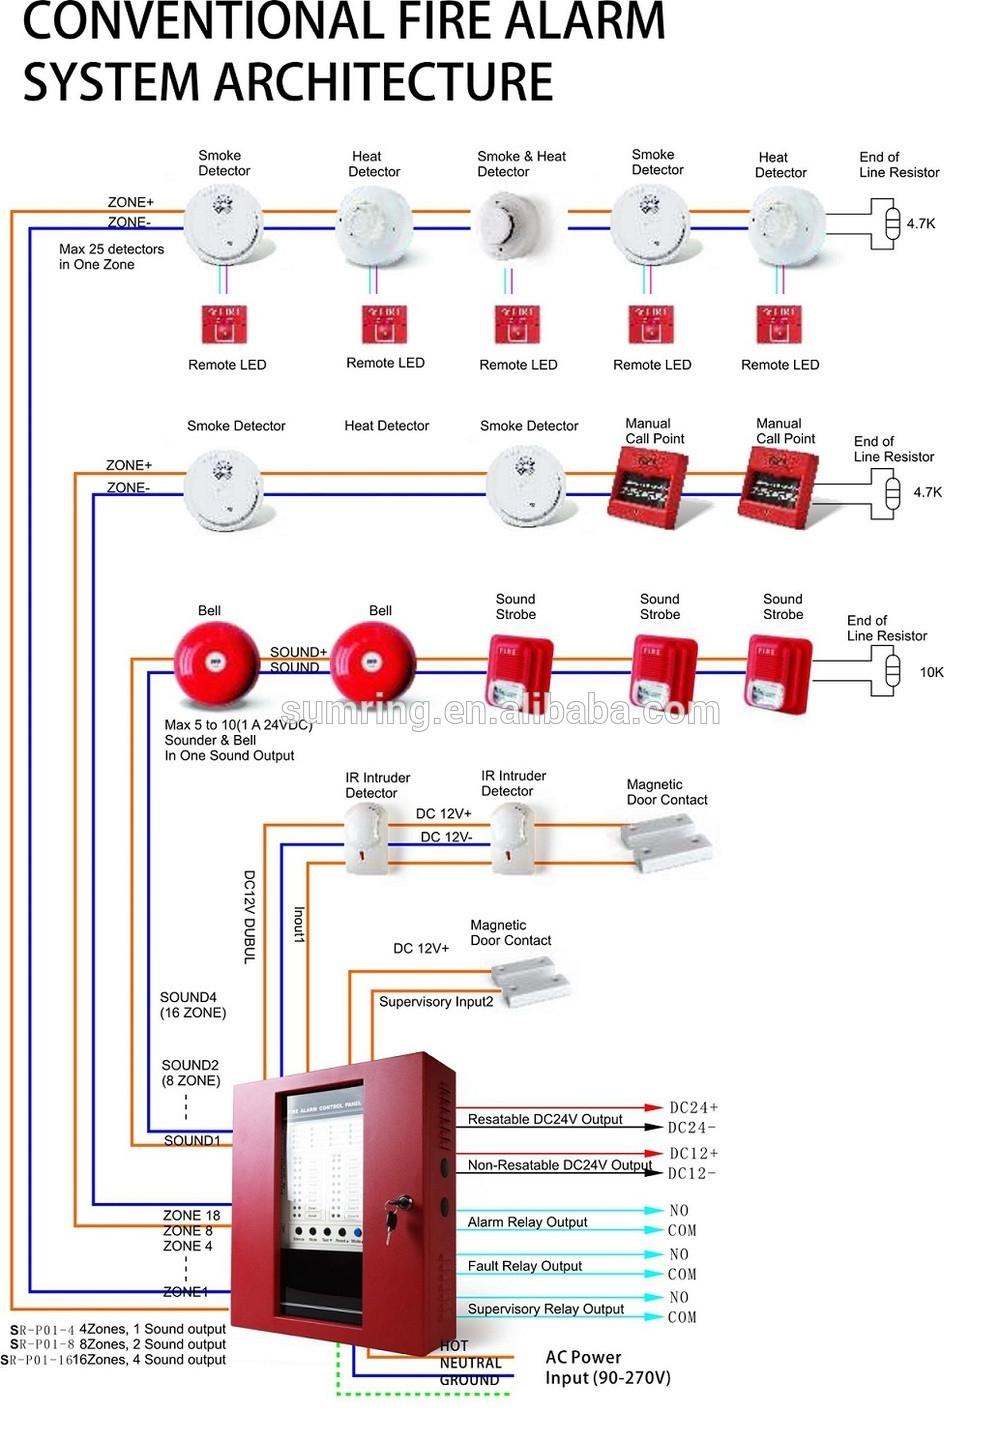 medium resolution of fire alarm wiring diagram pdf wiring diagram fire alarm system and pdf teamninjaz me fair